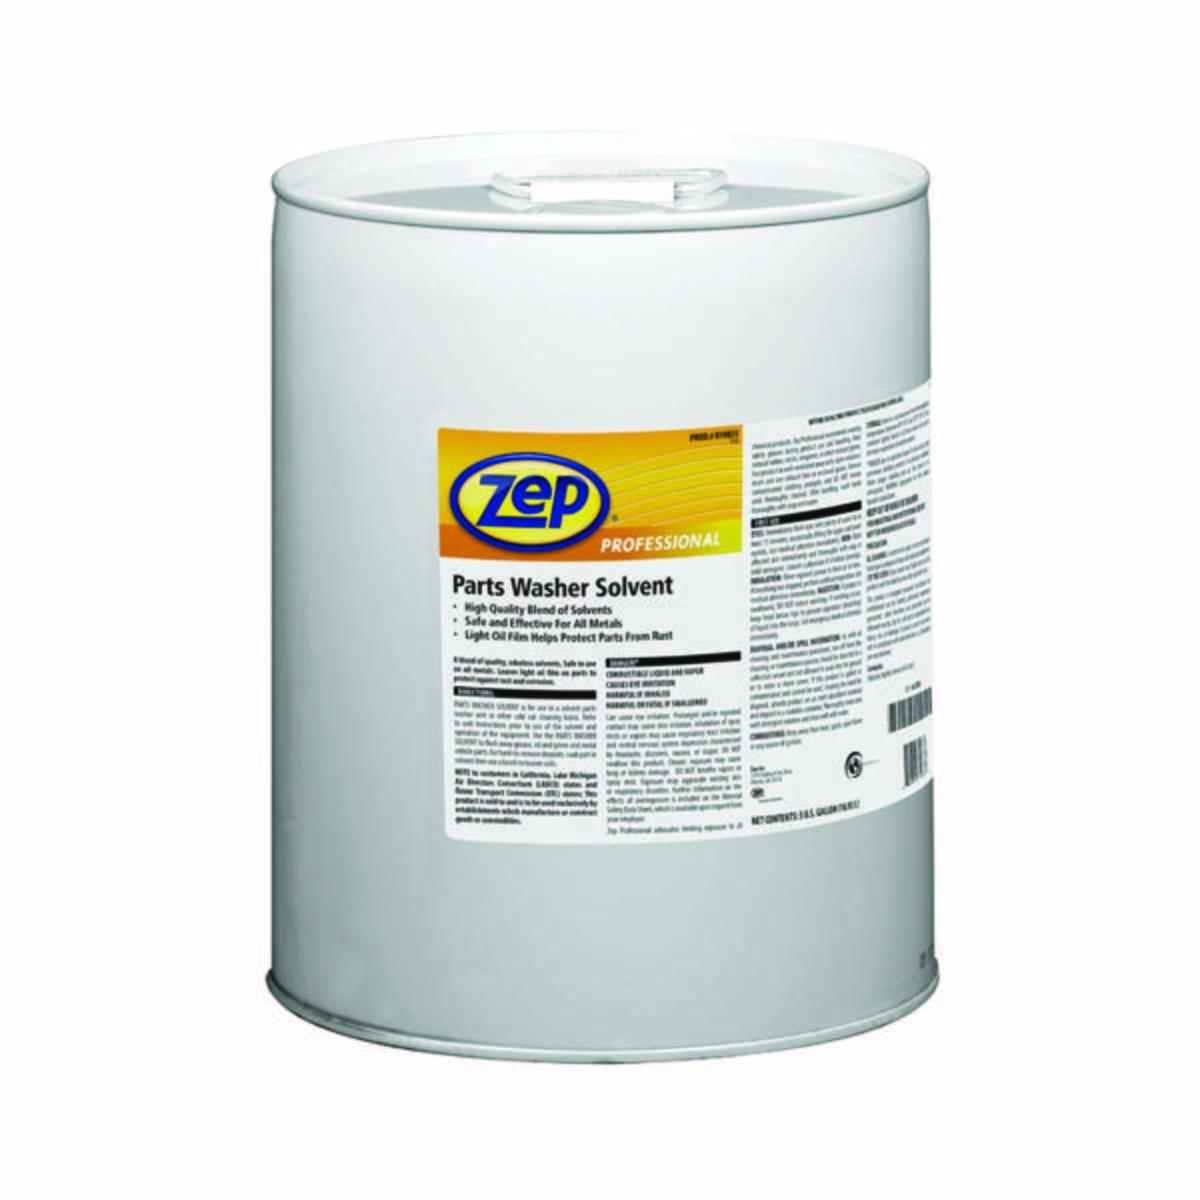 ZEP Parts-Washer-Solvent